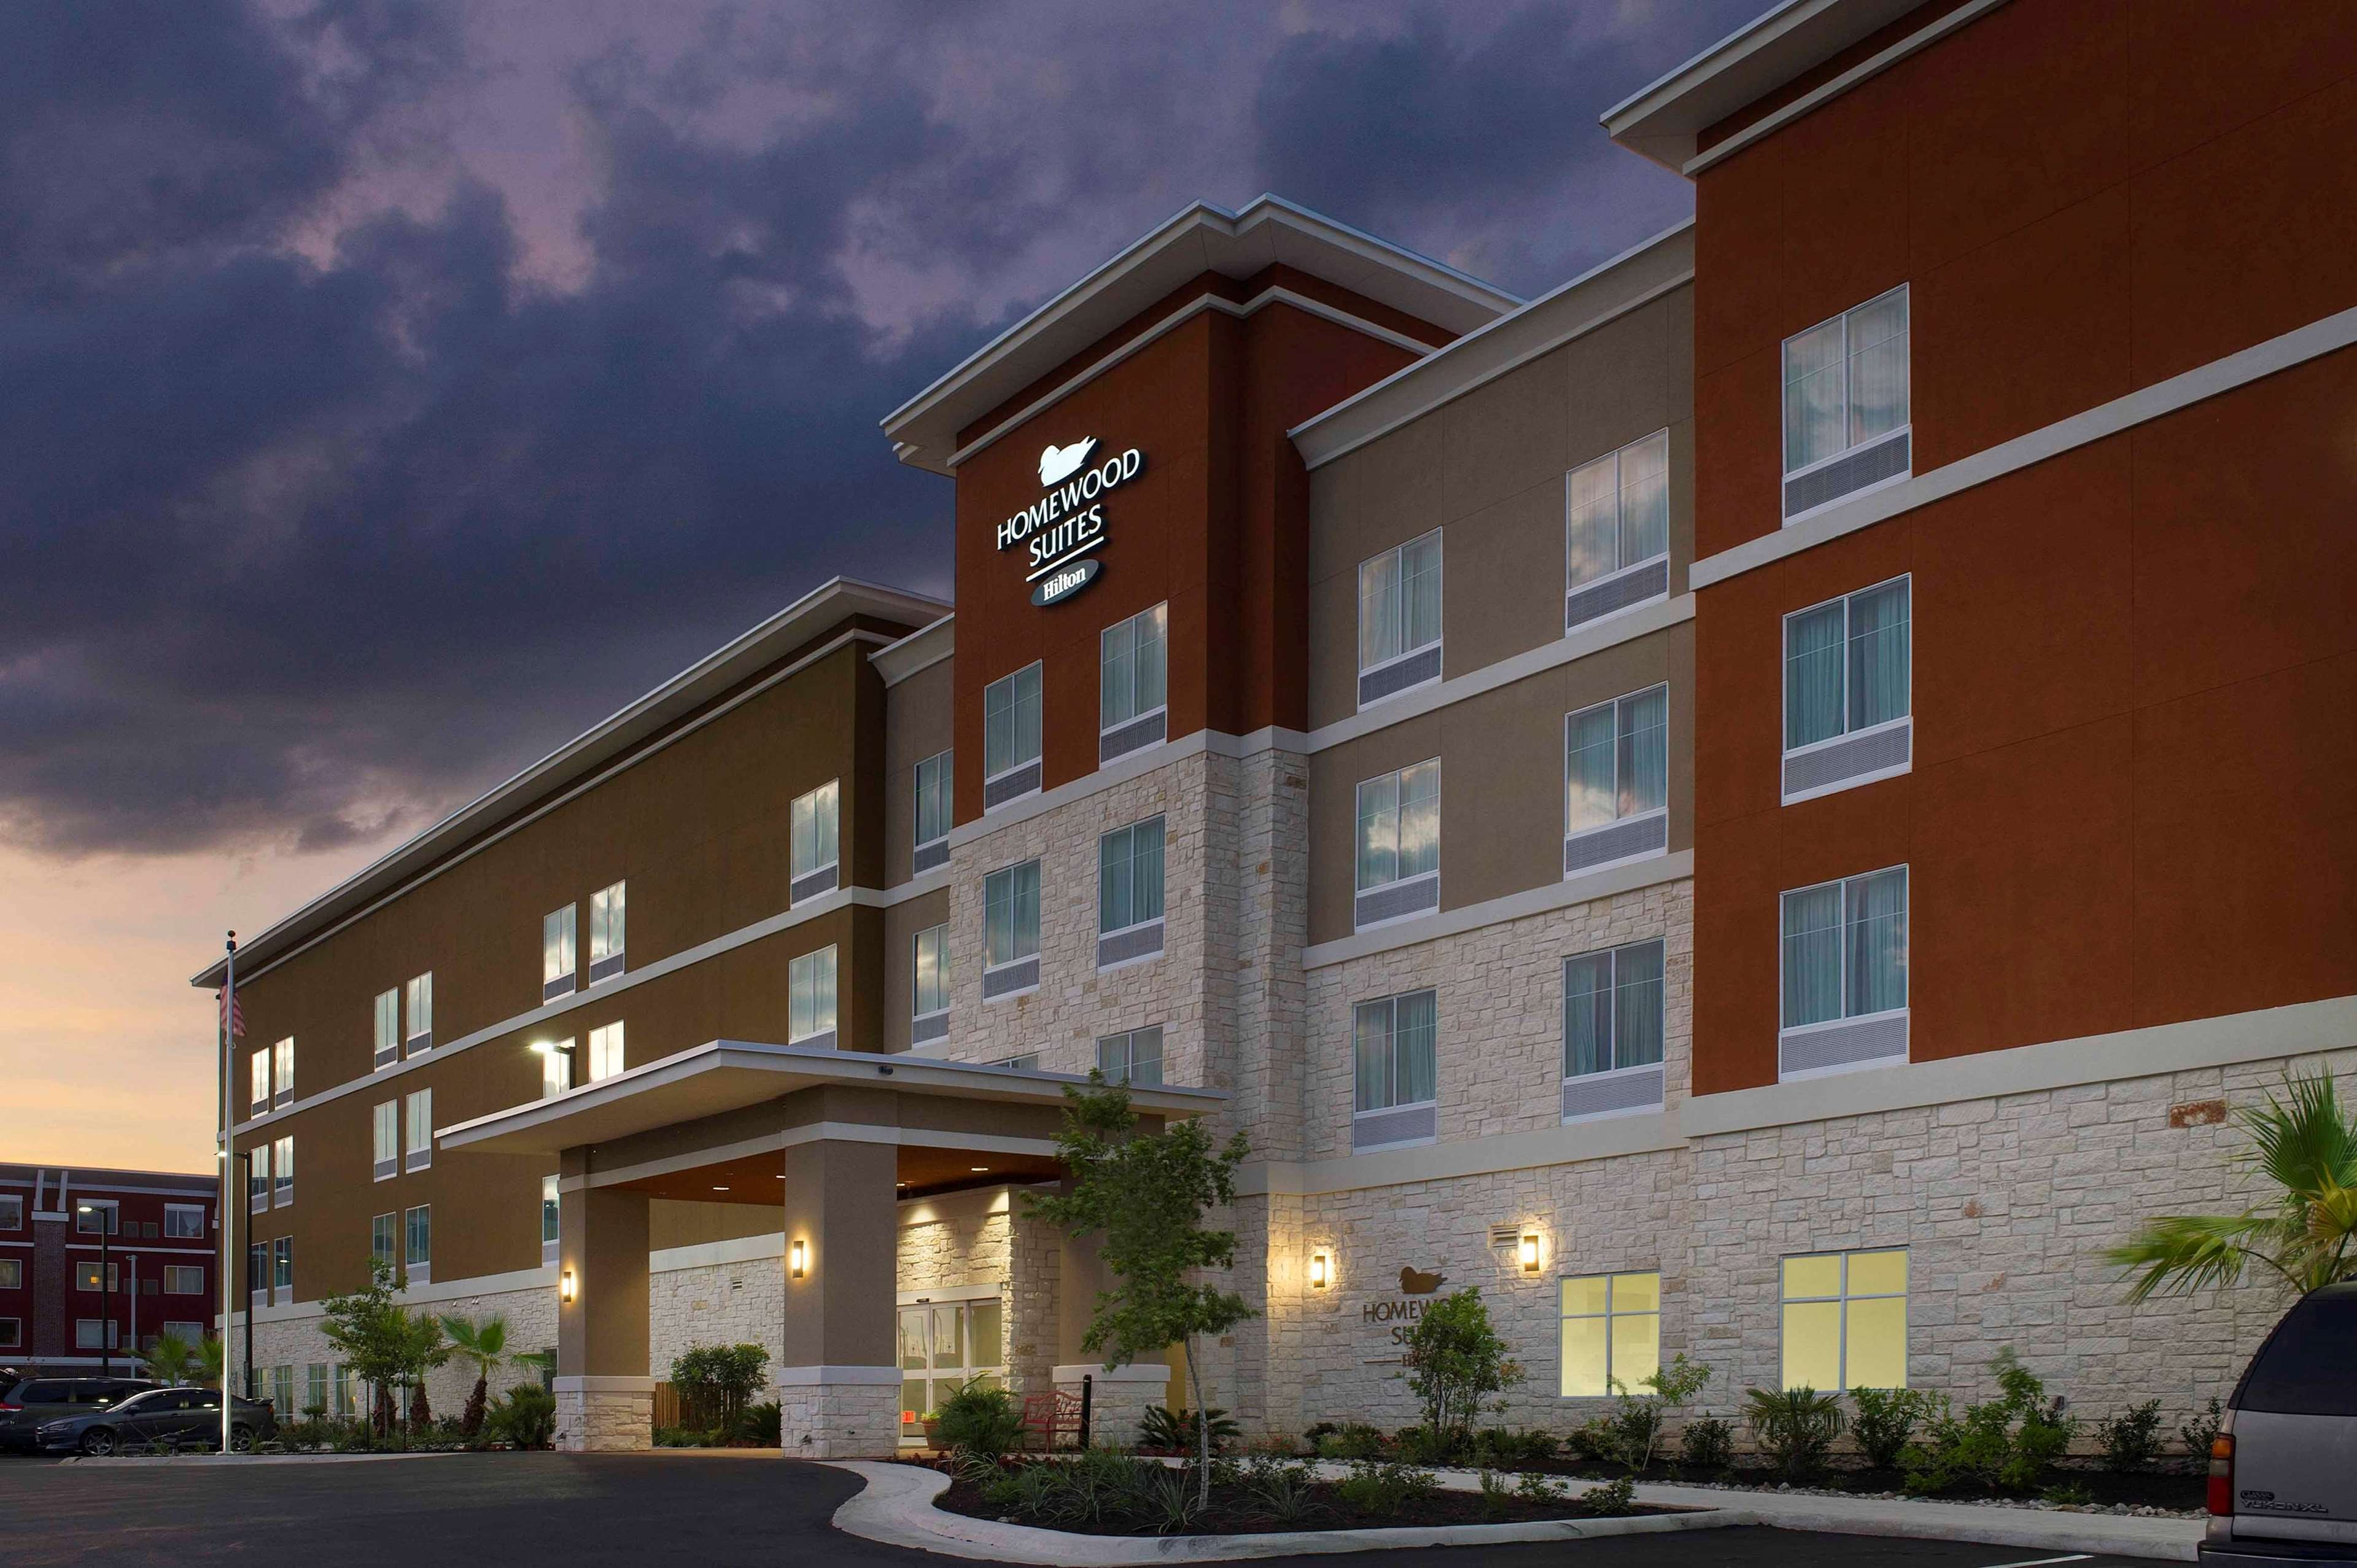 Hotels On Broadway Street In San Antonio Texas